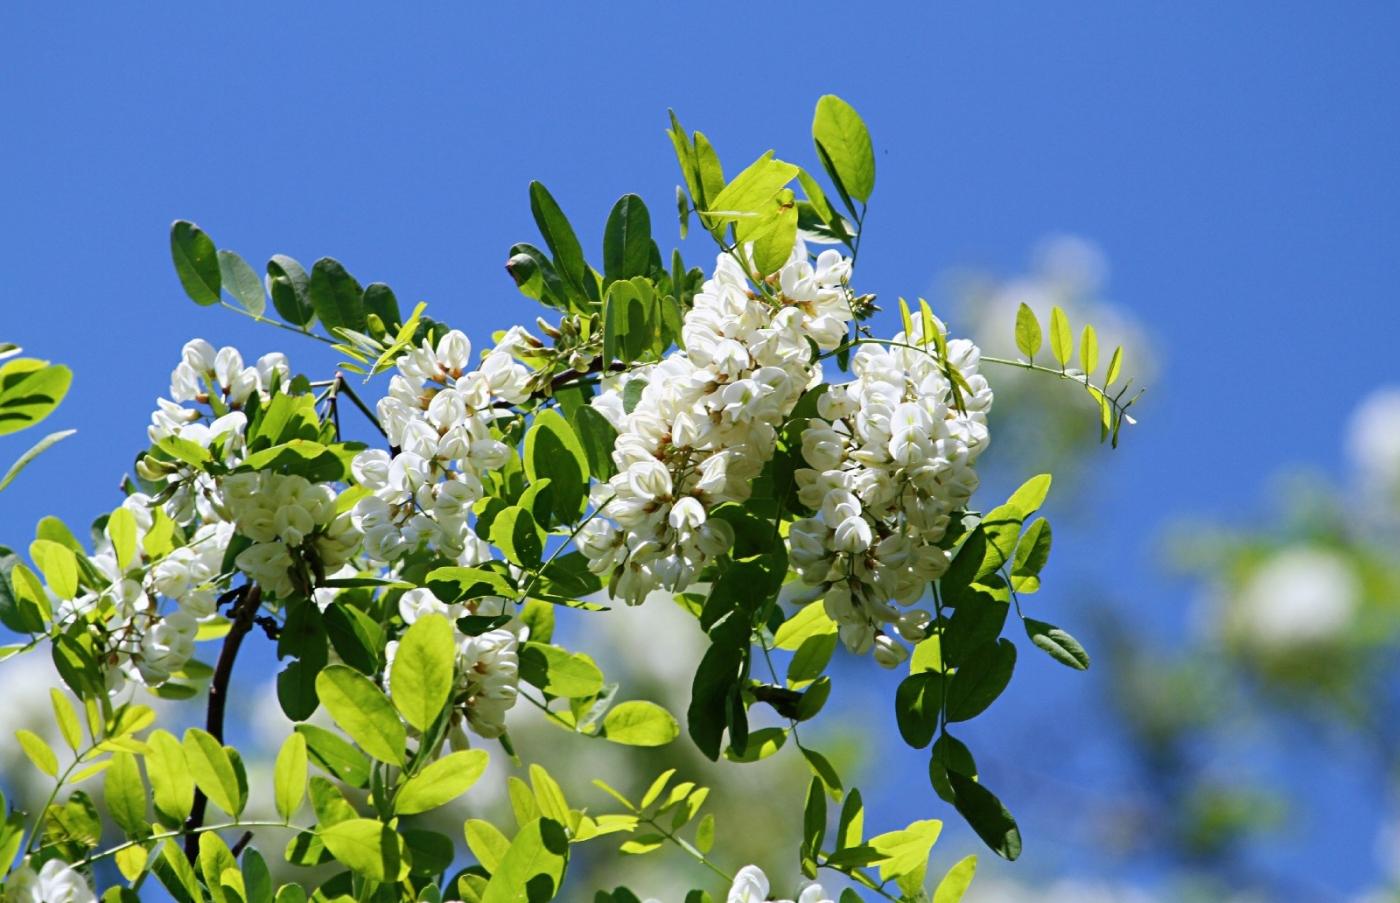 【田螺随拍】美国黄杨american yellowwood_图1-6